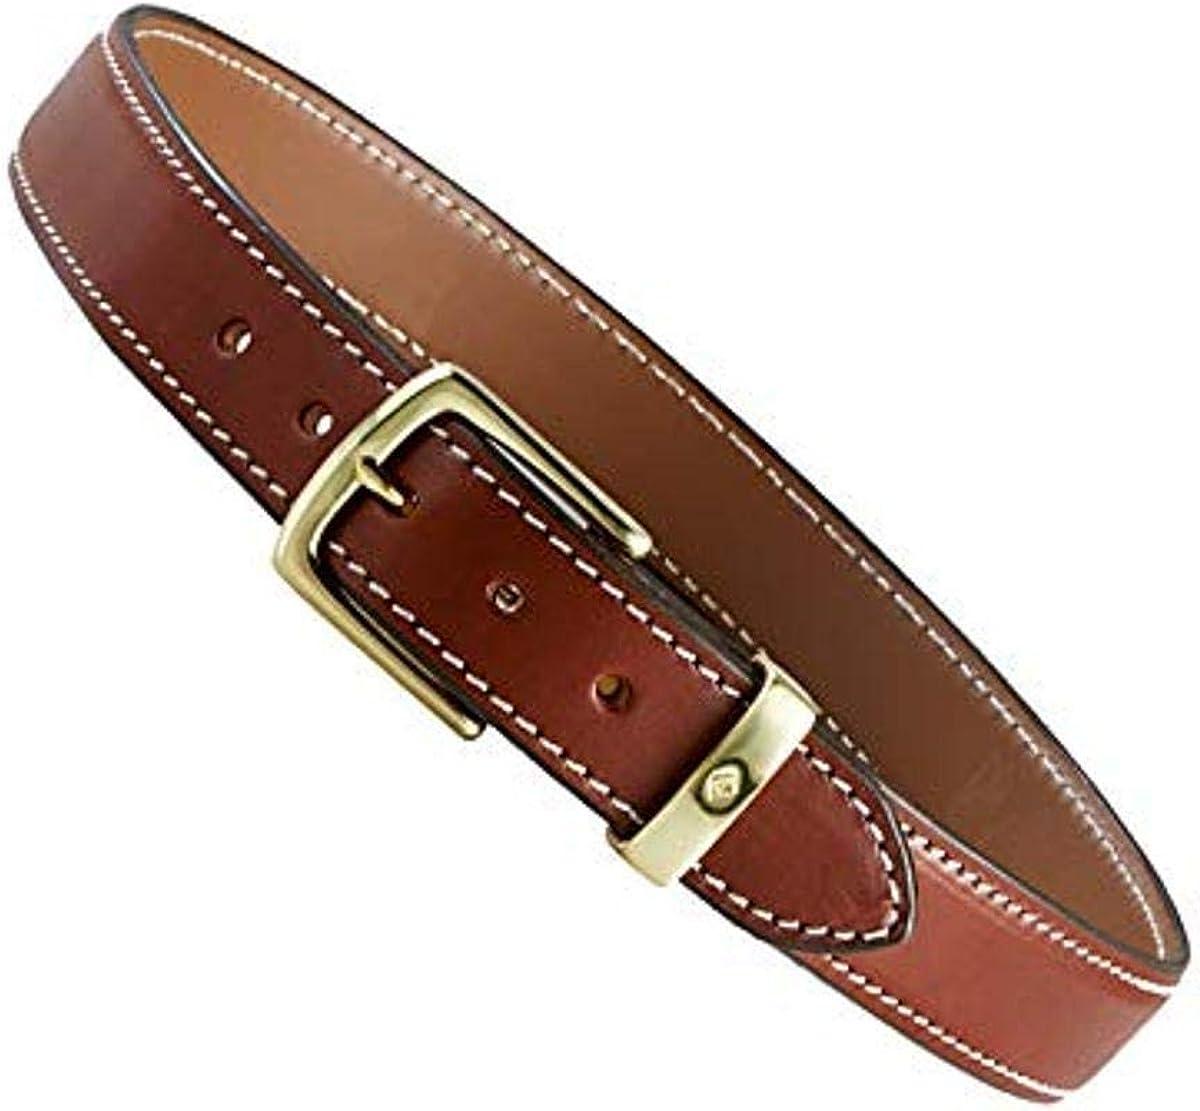 Aker Leather B21 1-1 2